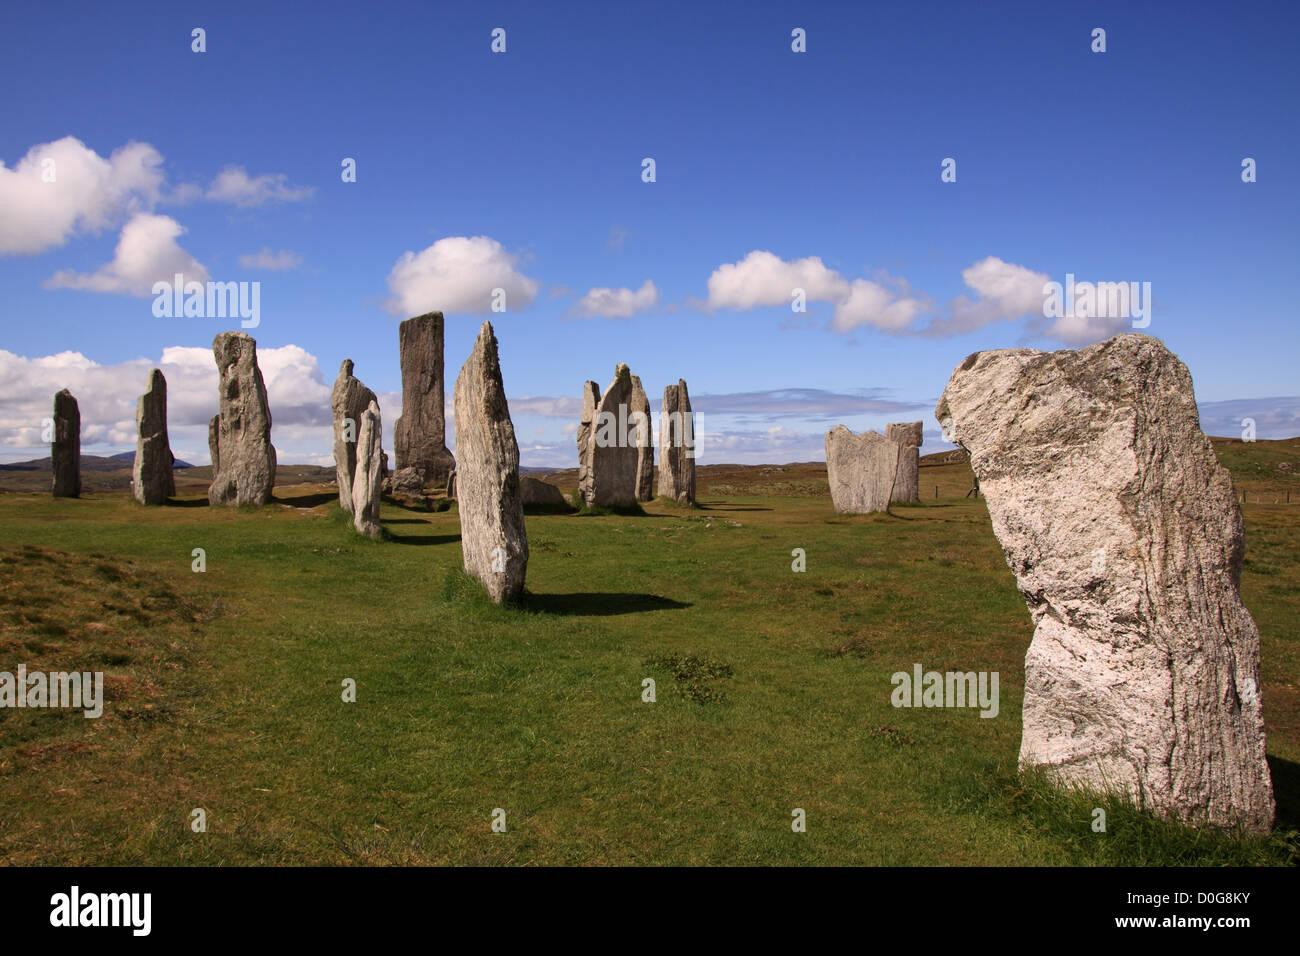 UK Scotland Outer Hebrides Isle of Lewis Callanish Standing Stones - Stock Image